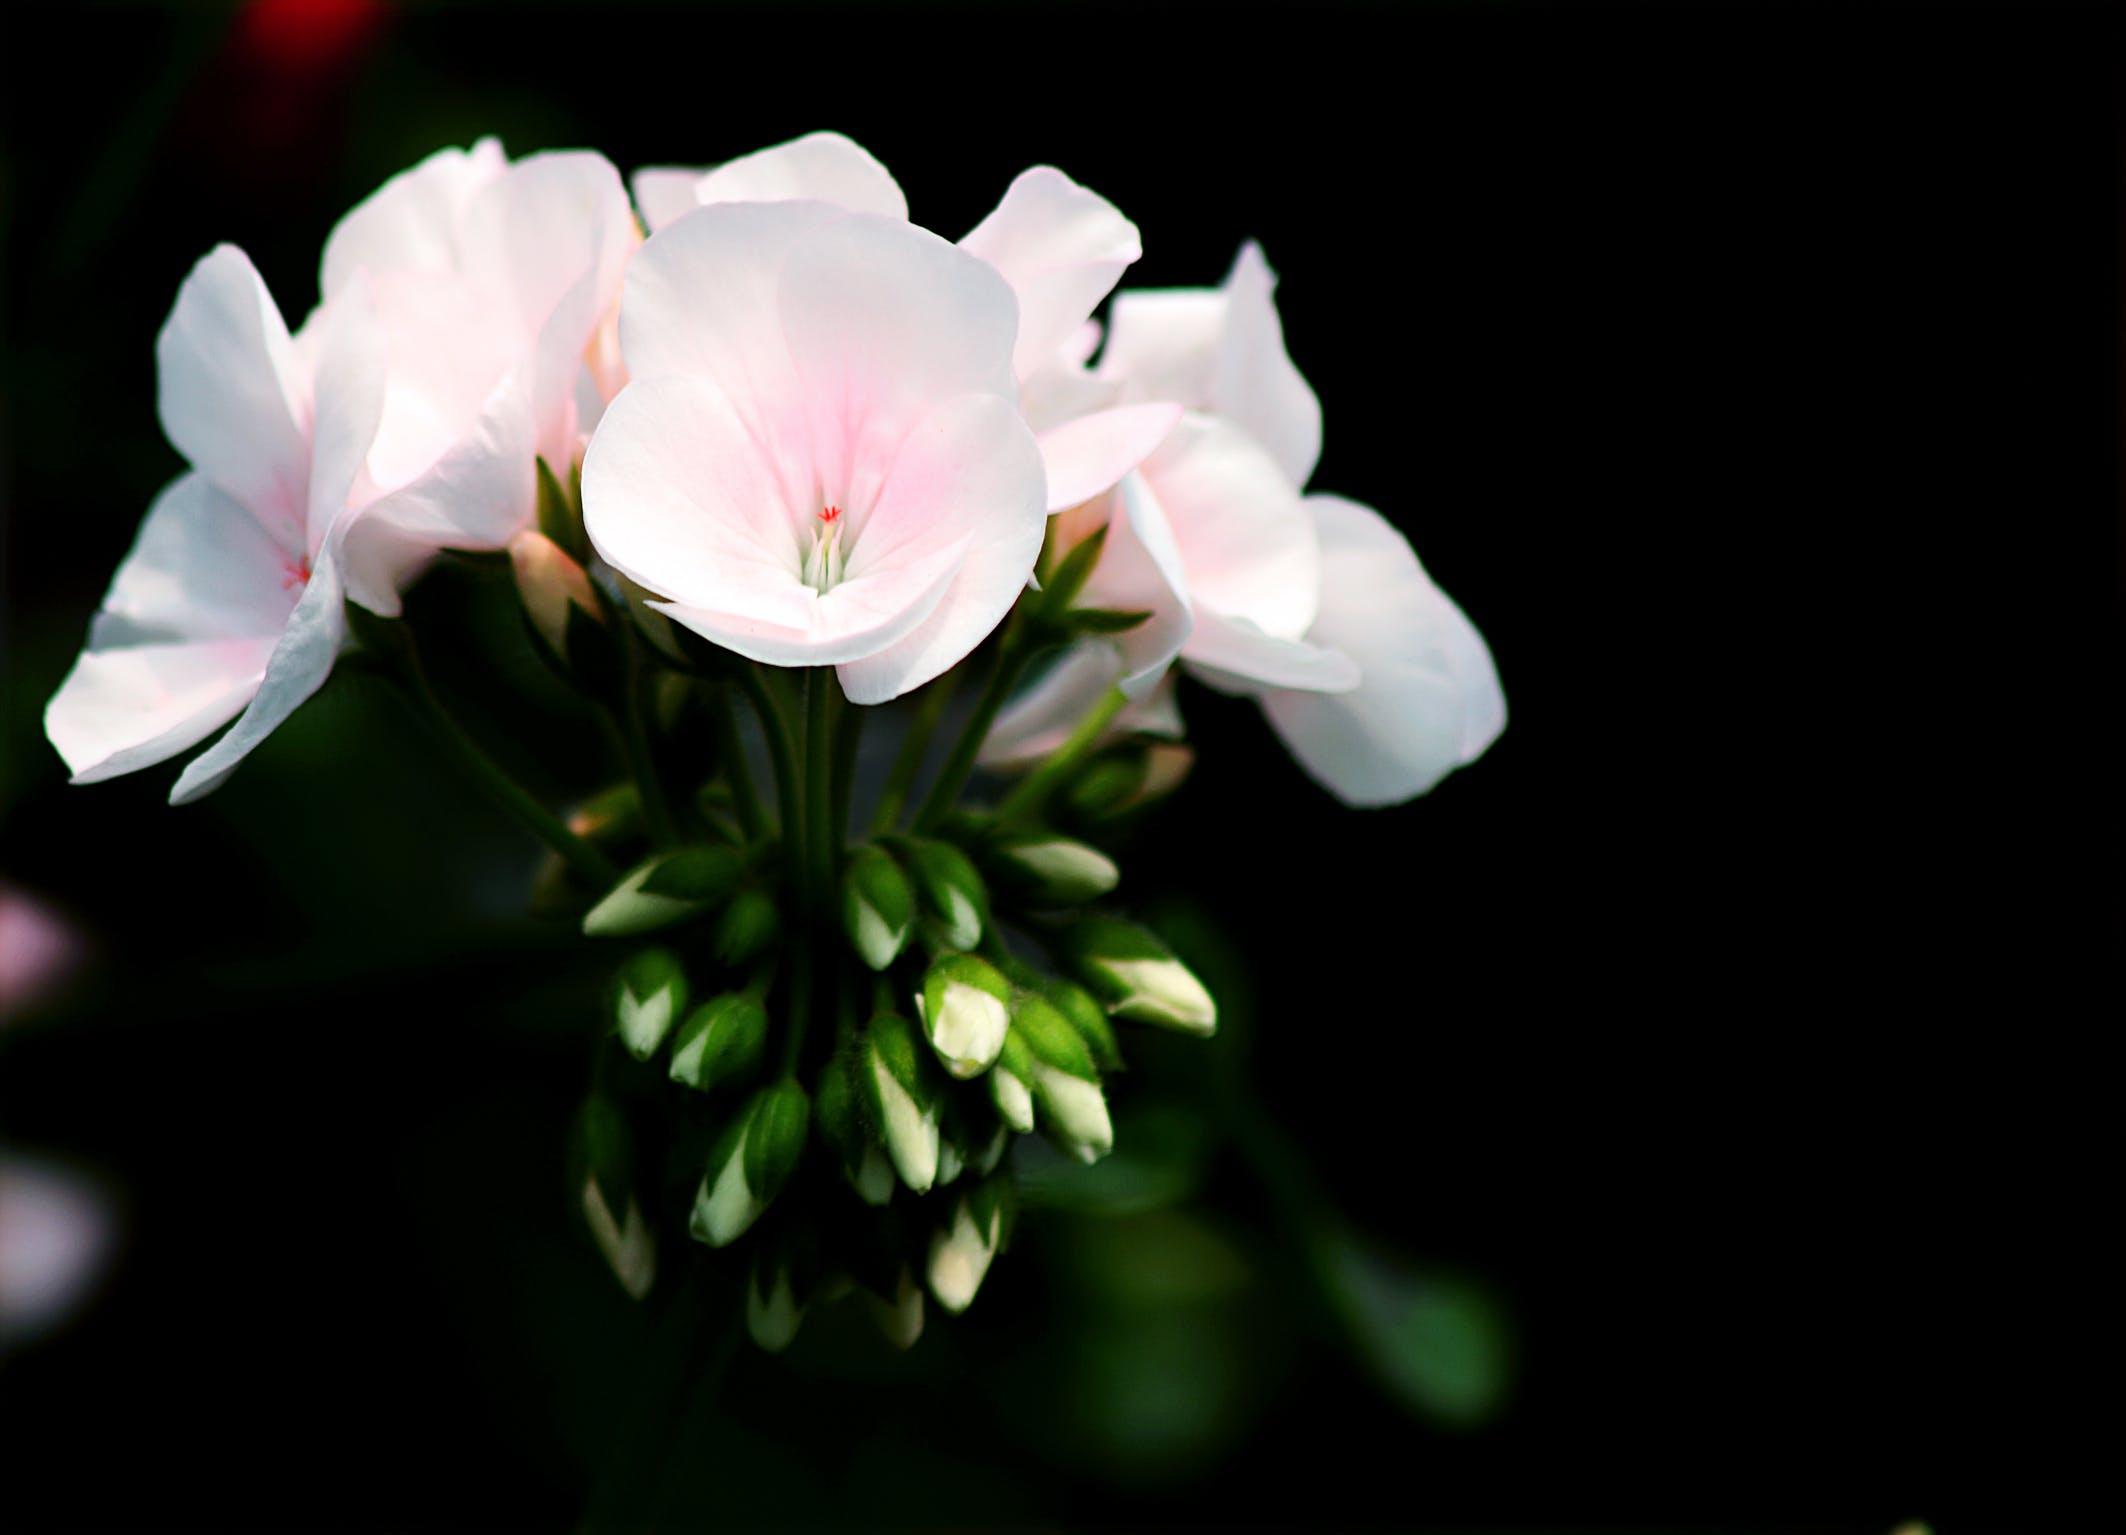 White Petal Flower Selective Focus Photography